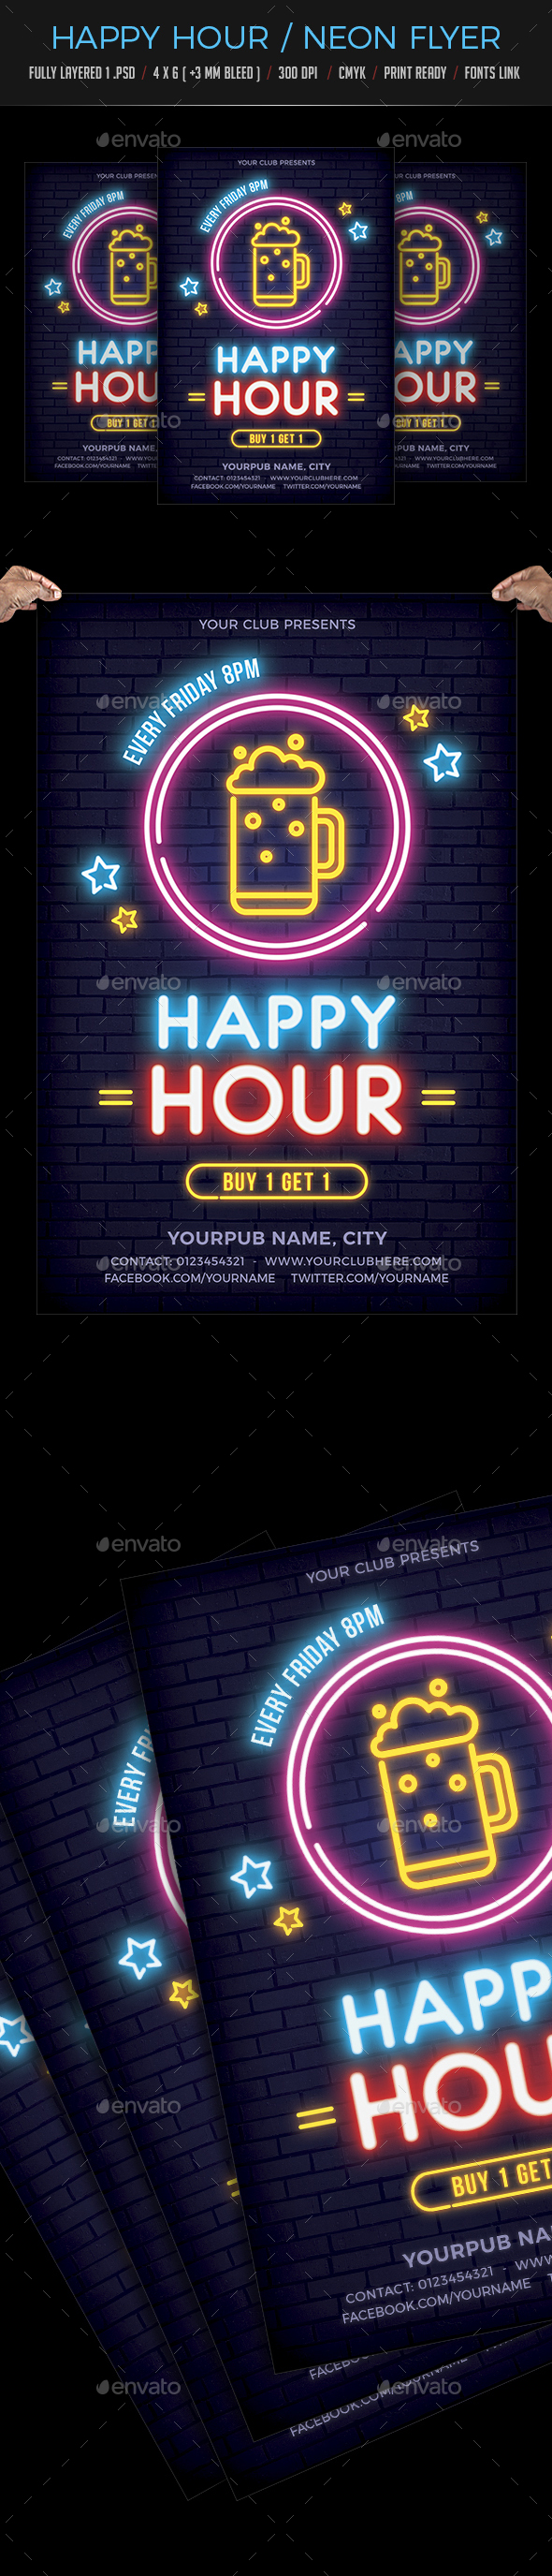 Happy Hour / Neon Flyer - Flyers Print Templates